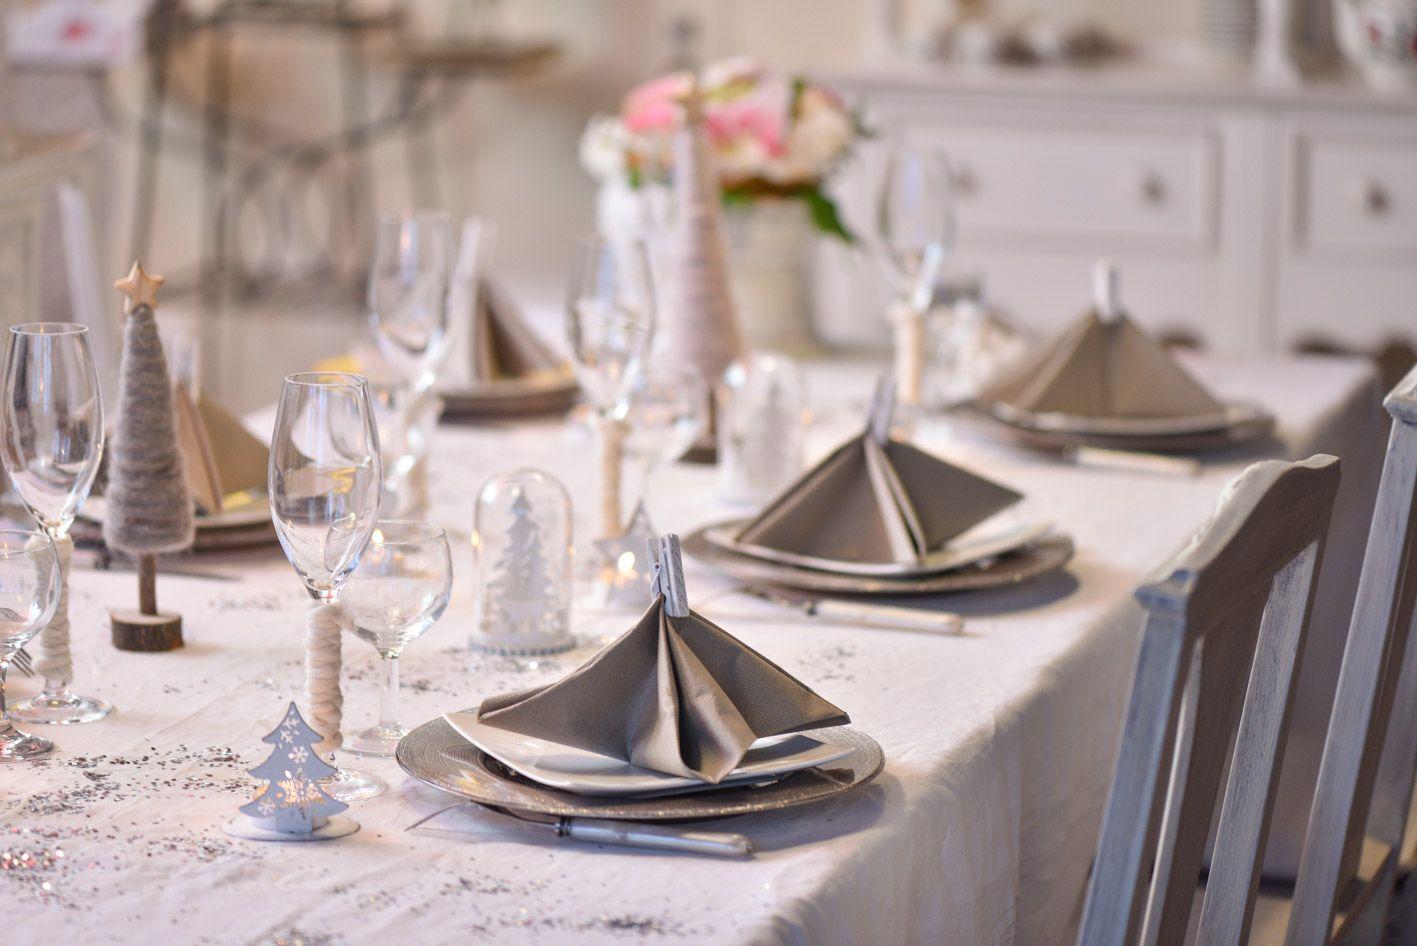 Charmant COCOONING Decoration De Table Santex // Pince Tricot Ref 5532 // #Cocooning  #table De Fete #decorationnoel #decorationdetable #decodetable #deco #table  ...